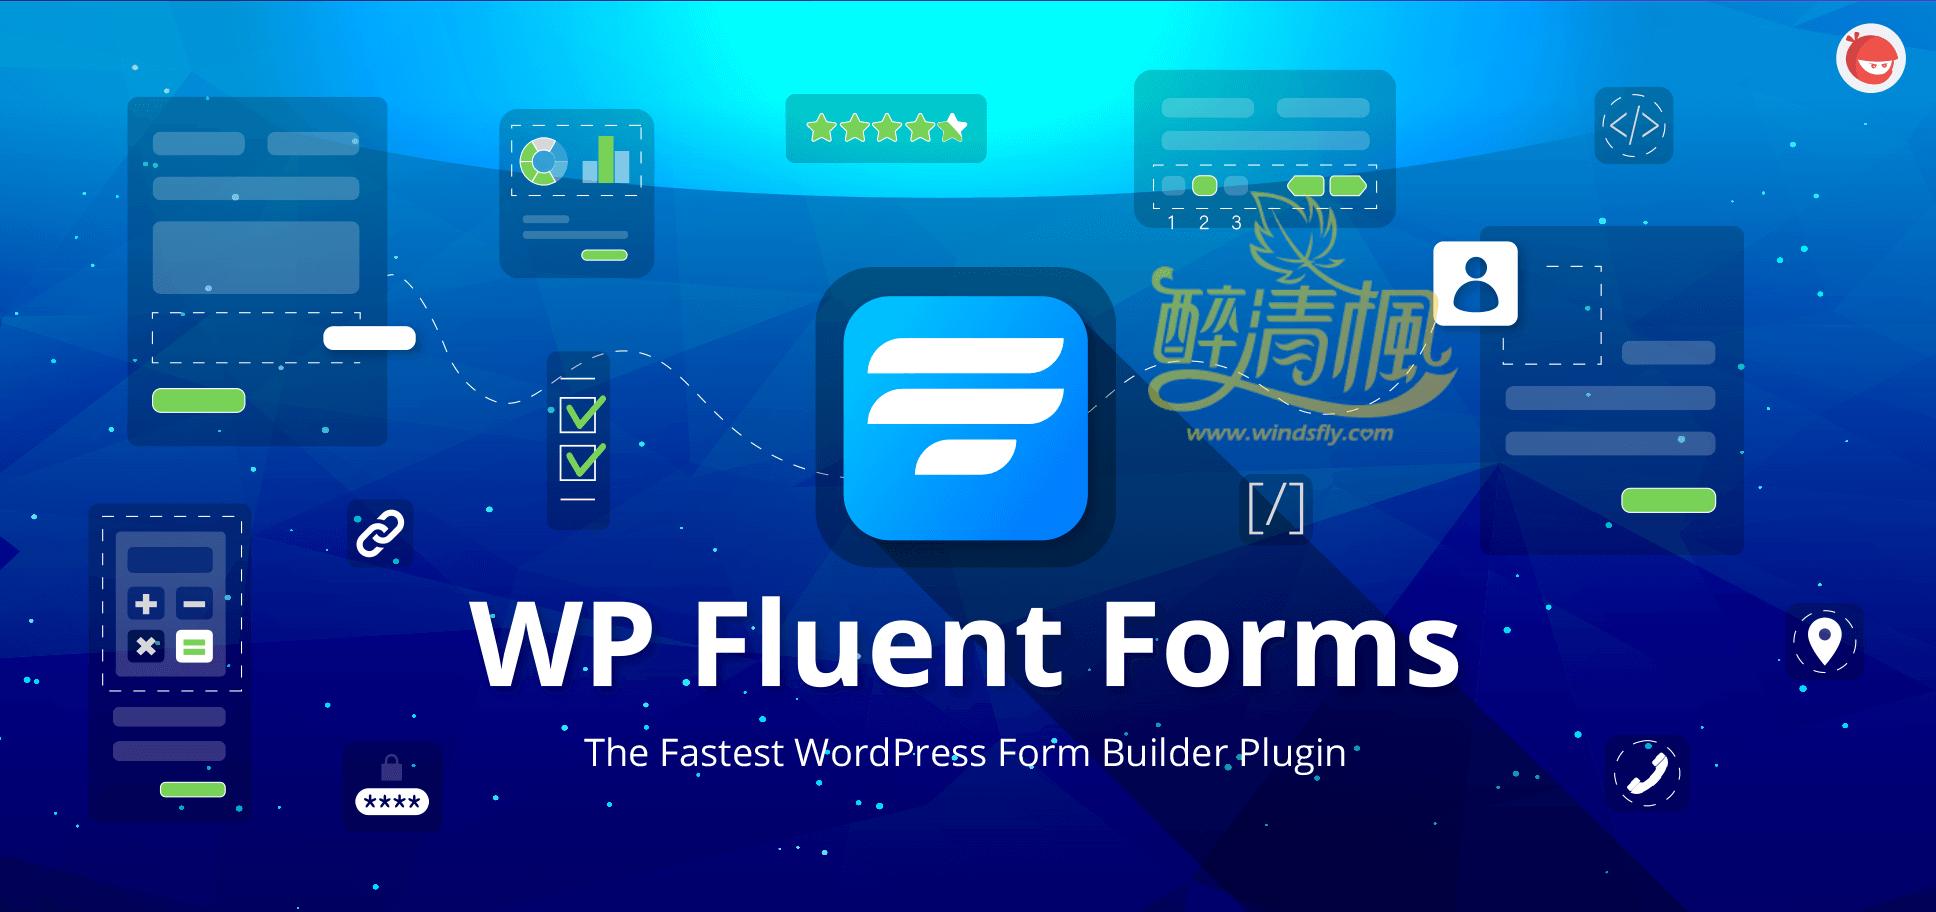 WordPress高级表单插件 - Fluent Forms Pro+扩展 v3.5.6(汉化) WordPress插件 第1张